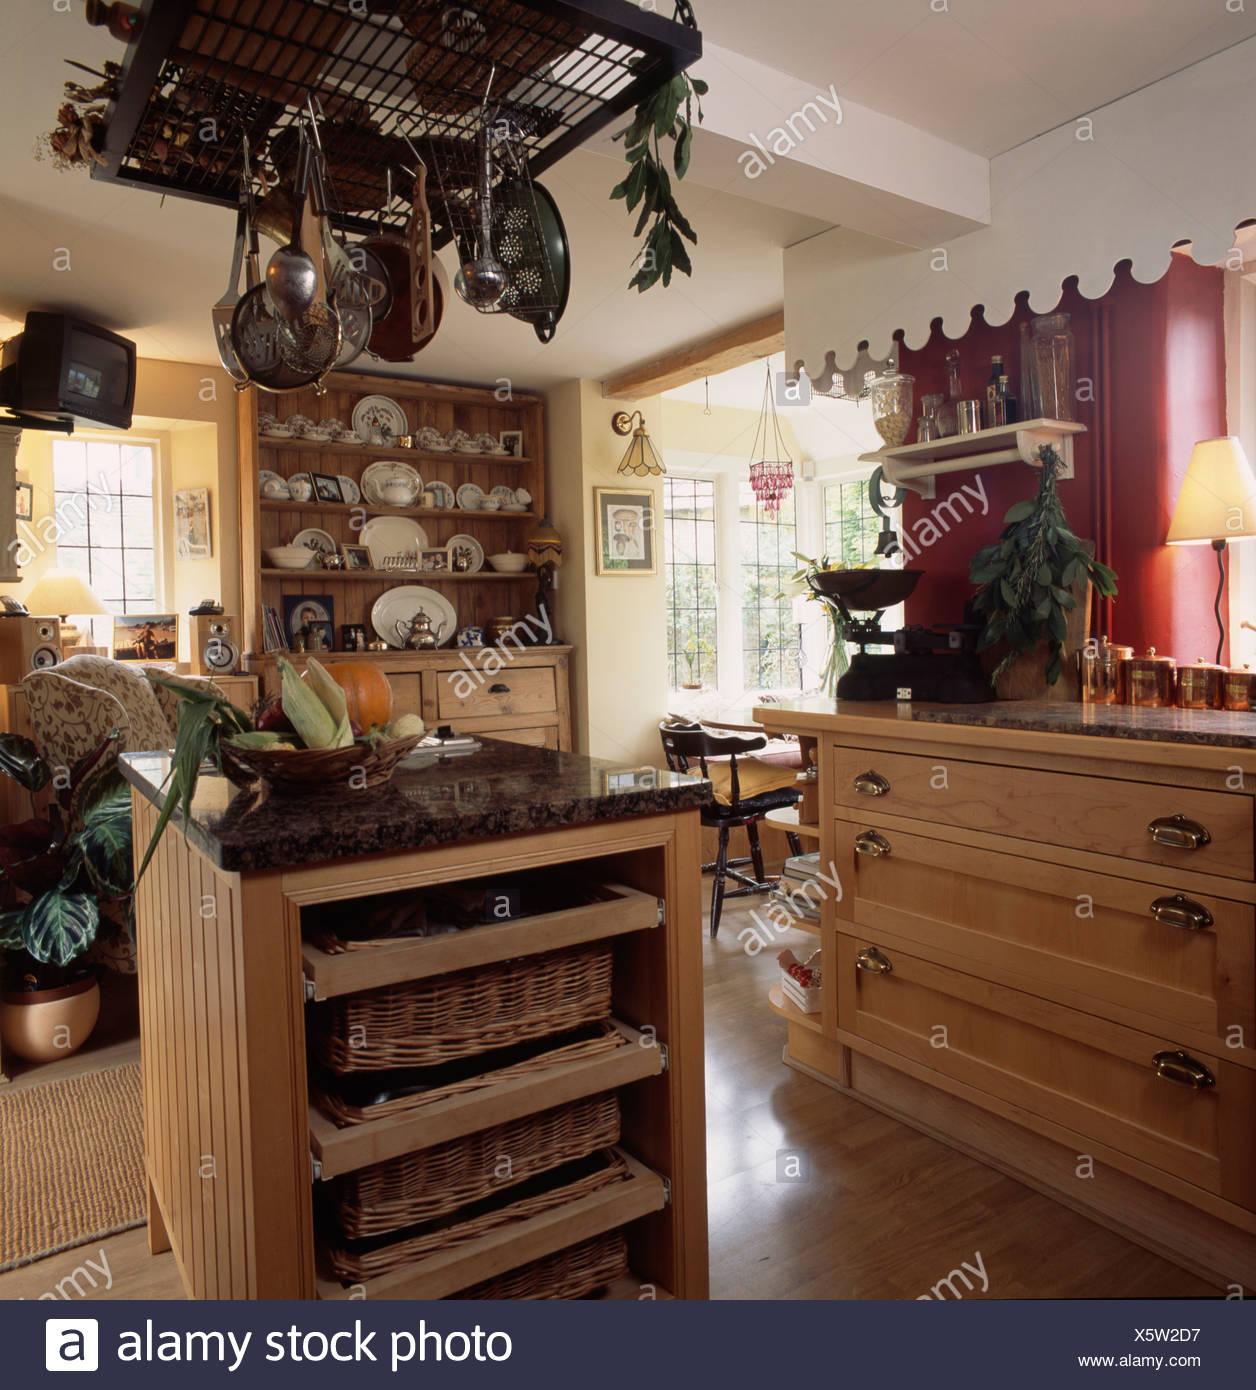 Pans on storage rack above island unit with wicker storage ...